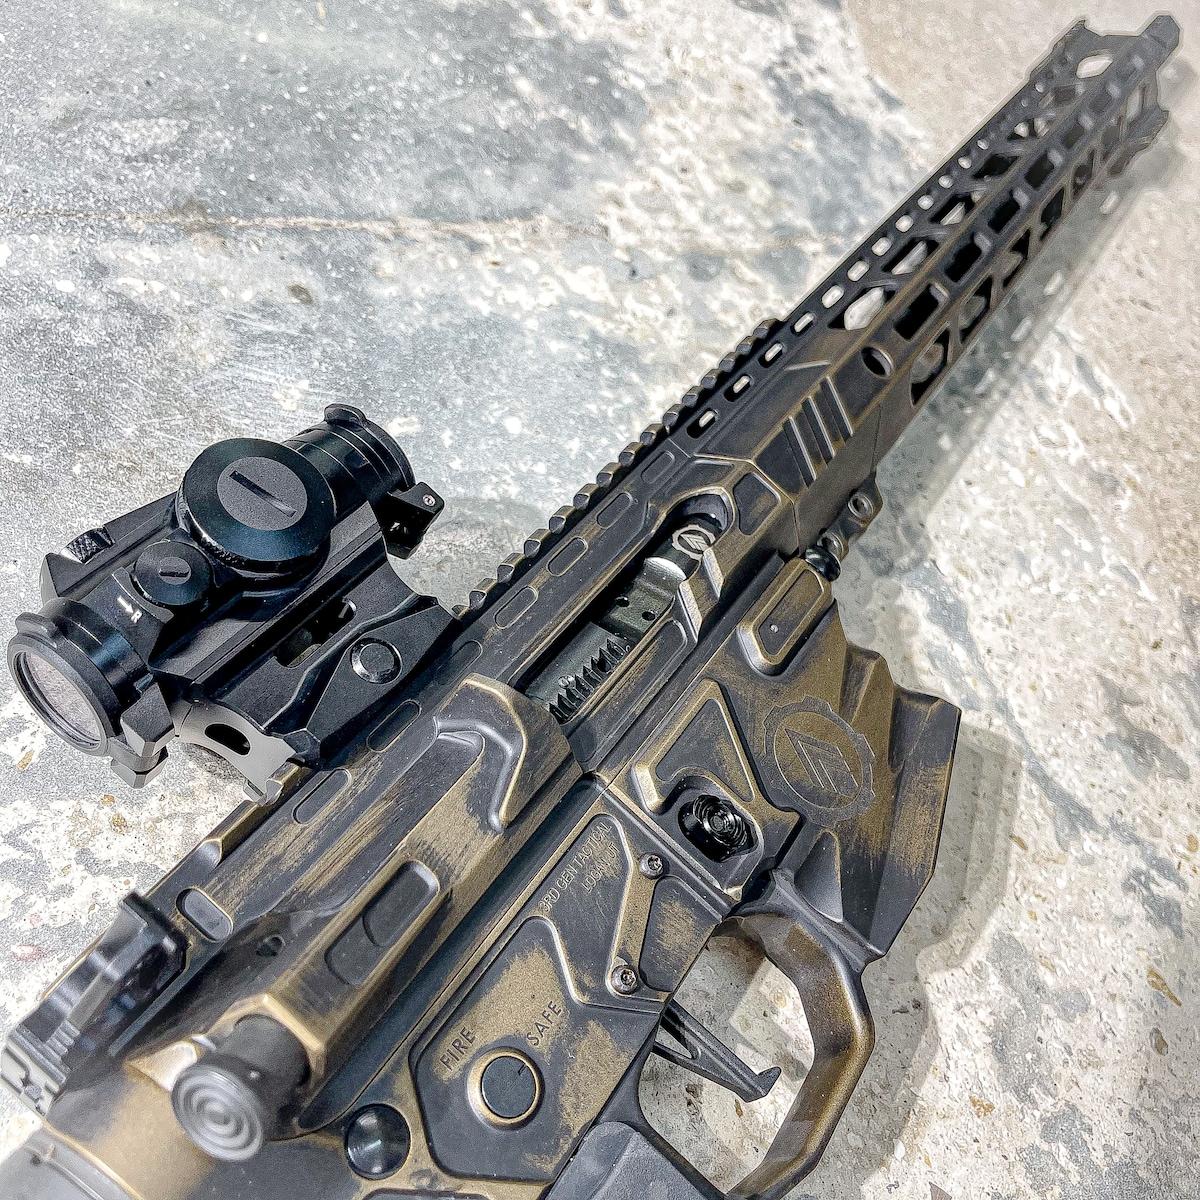 3RD GEN TACTICAL Patriot Carbine